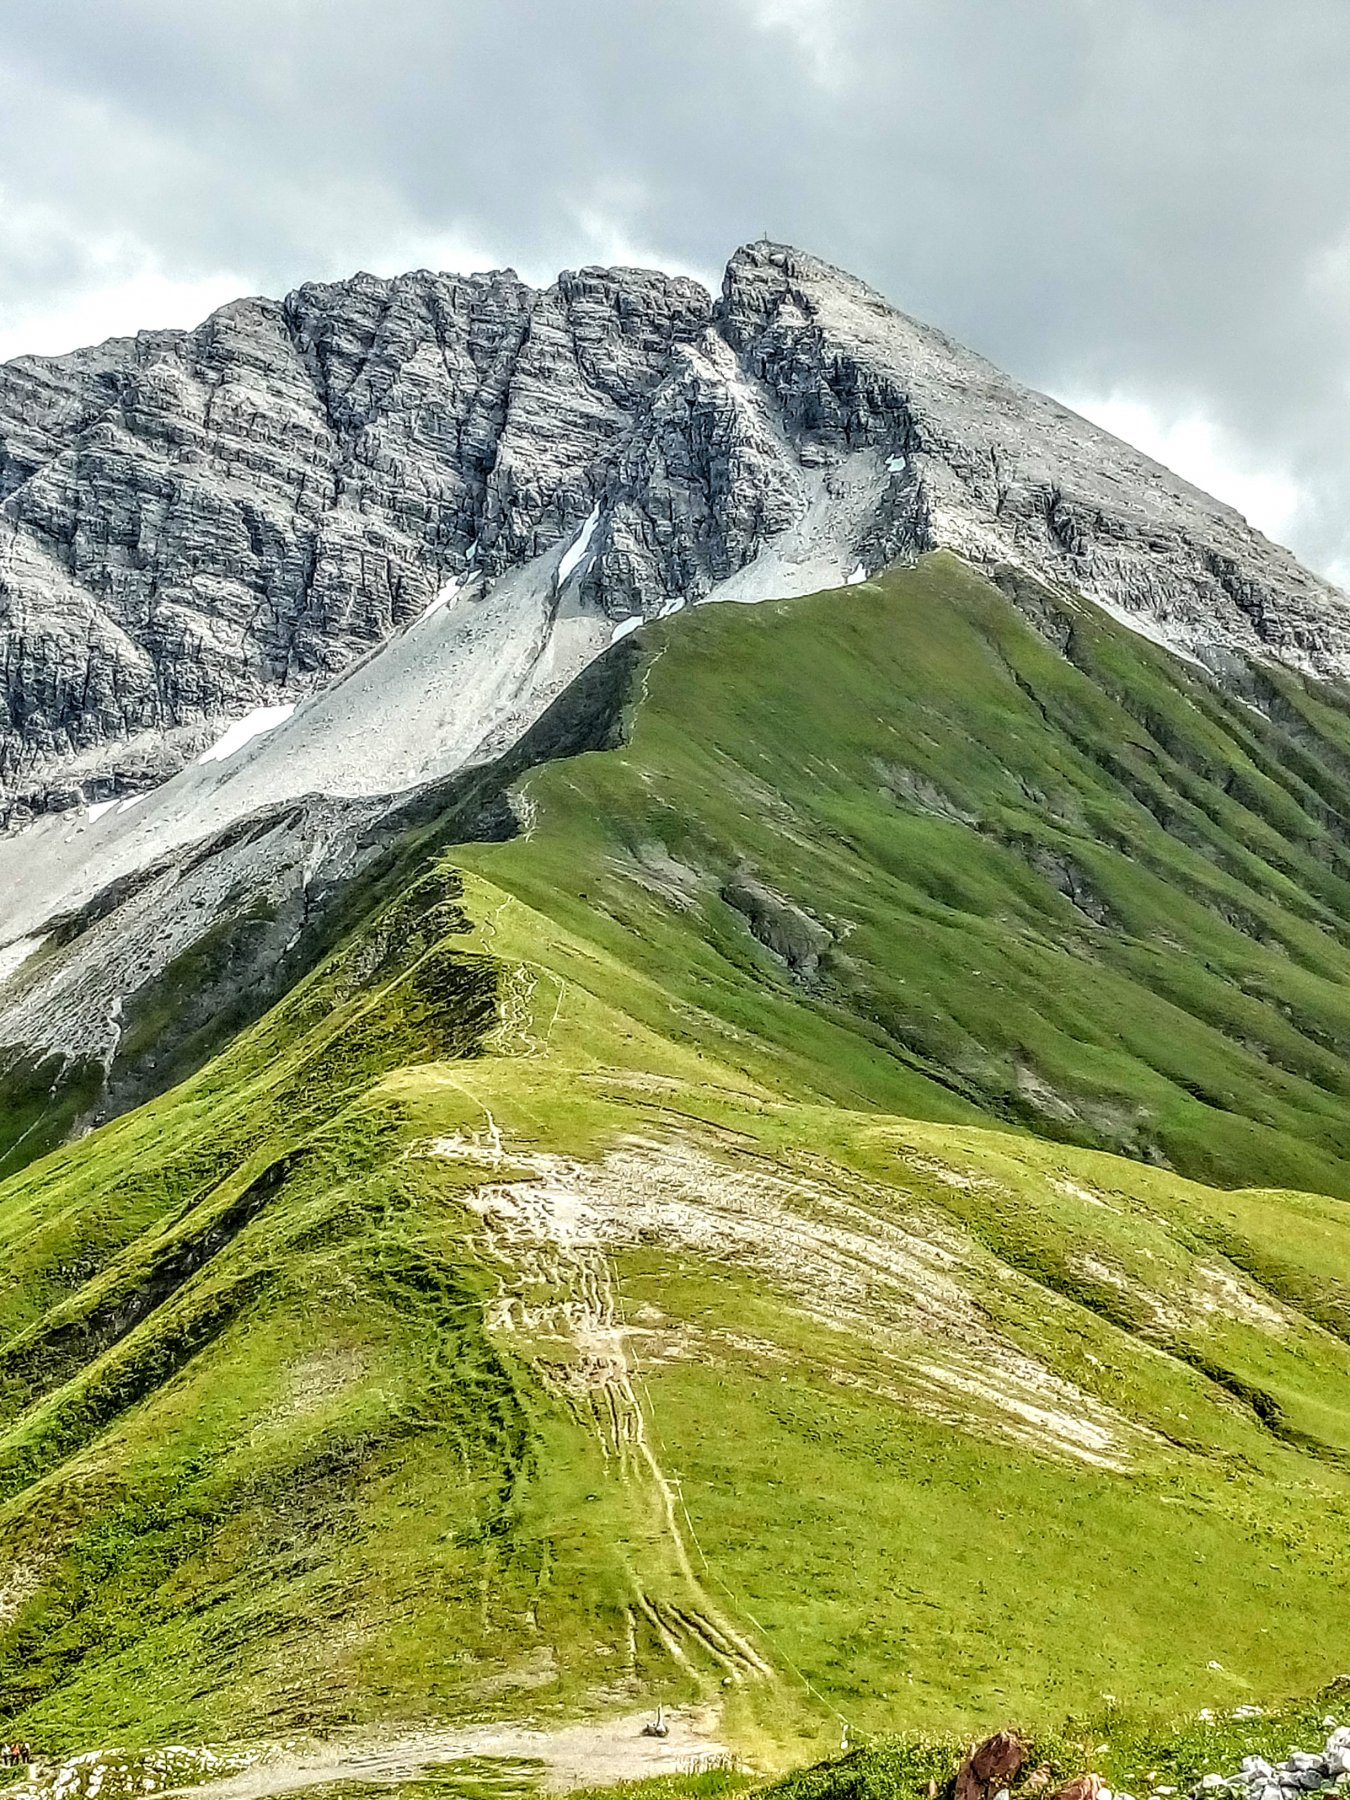 Rufispitze da Lech al parco geologico del Rufispitze 2019-08-23